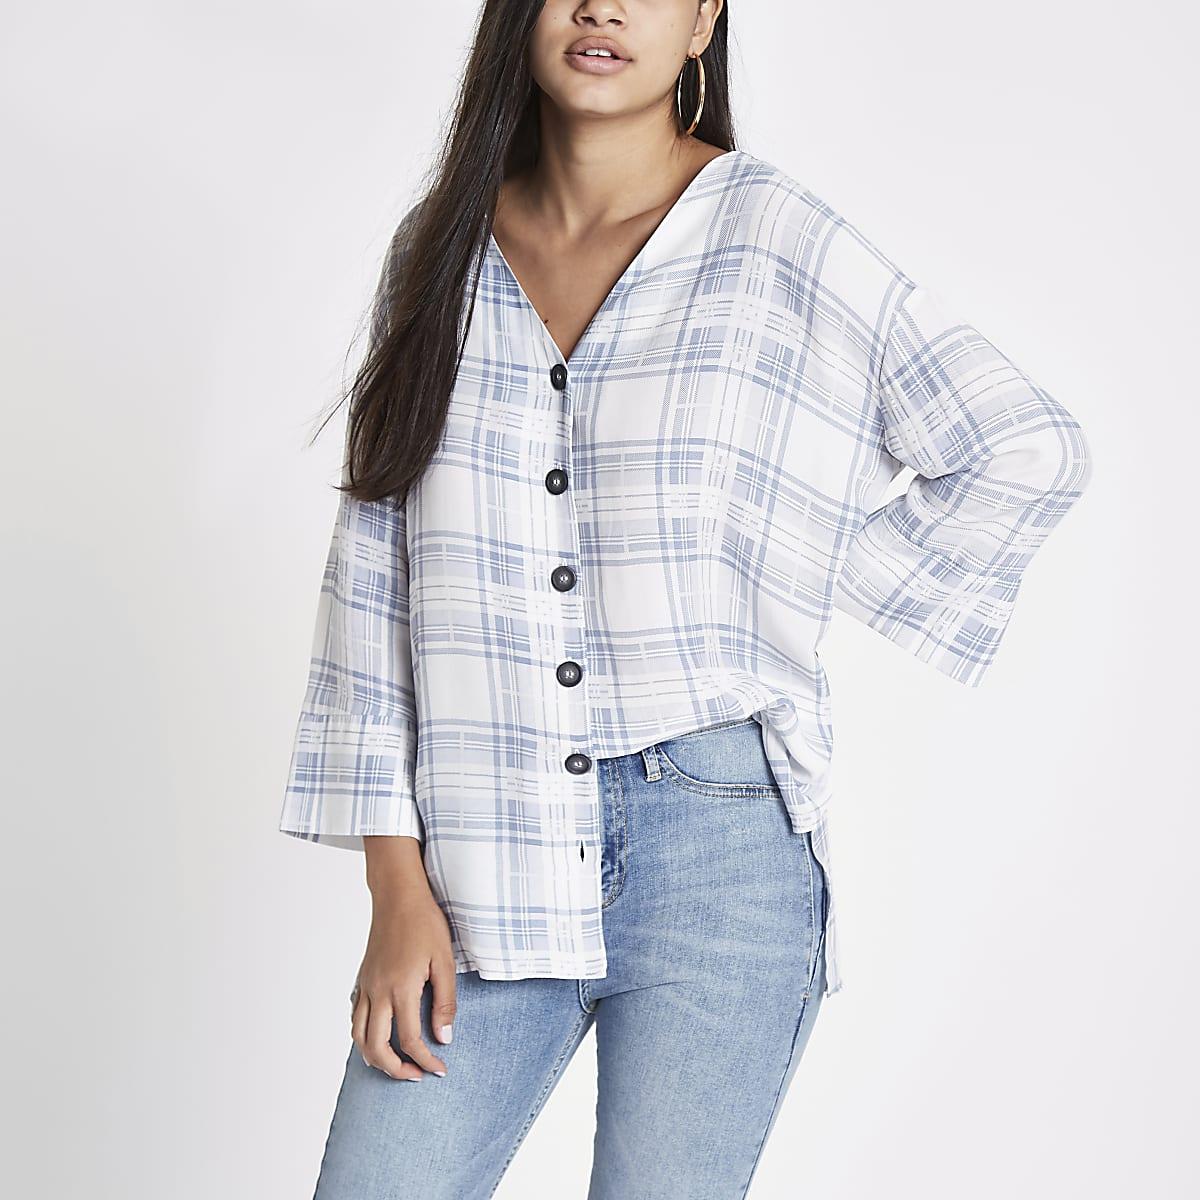 Blauwe geruite blouse met band op de rug en knoopsluiting voor